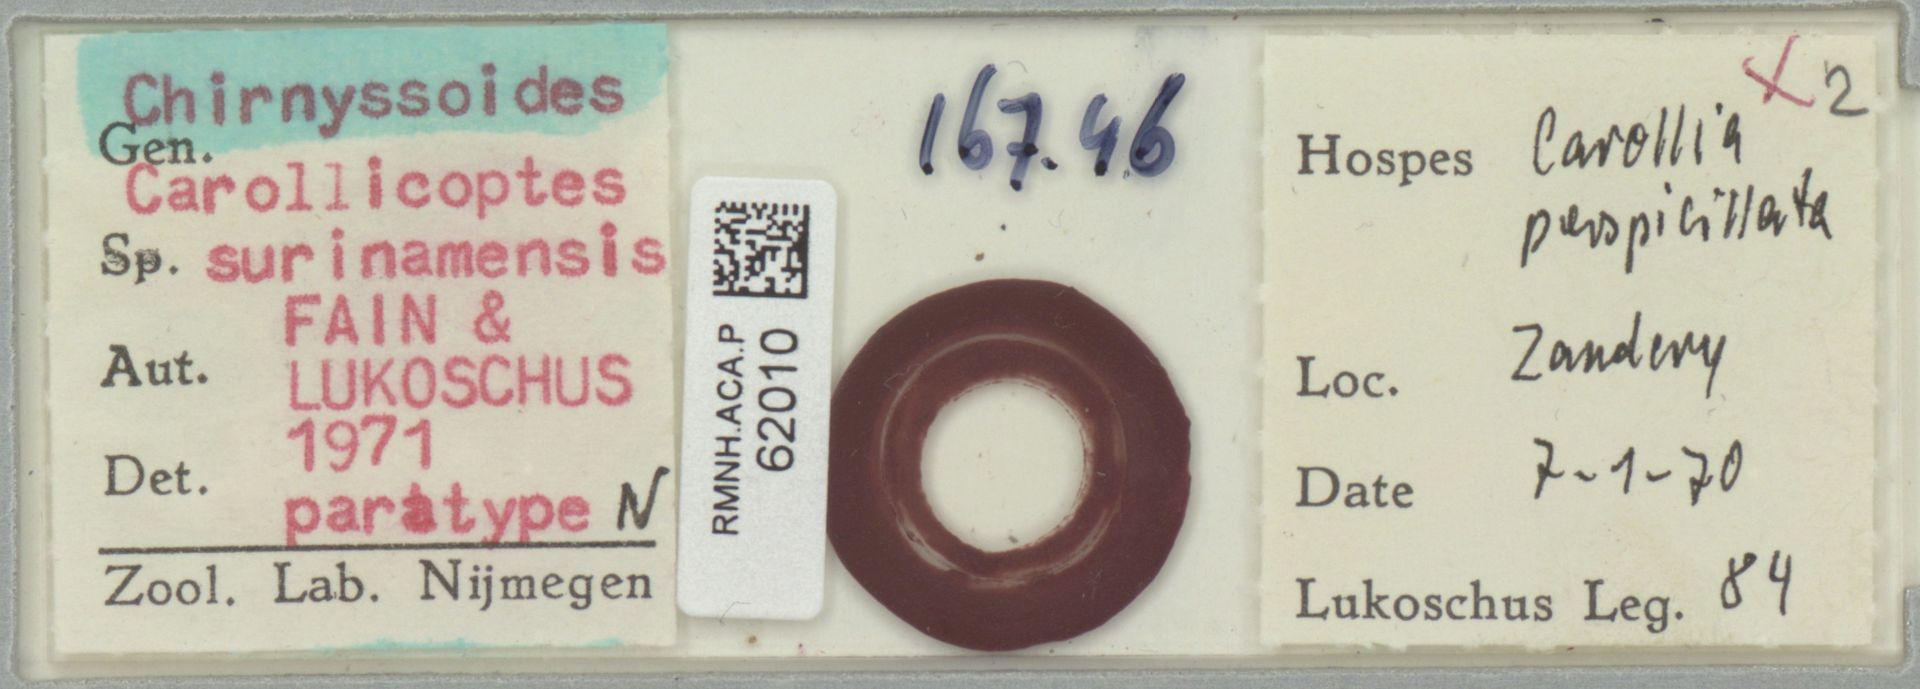 RMNH.ACA.P.62010 | Chirnyssoides carollicoptes surinamensis Fain & Lukoschus 1971